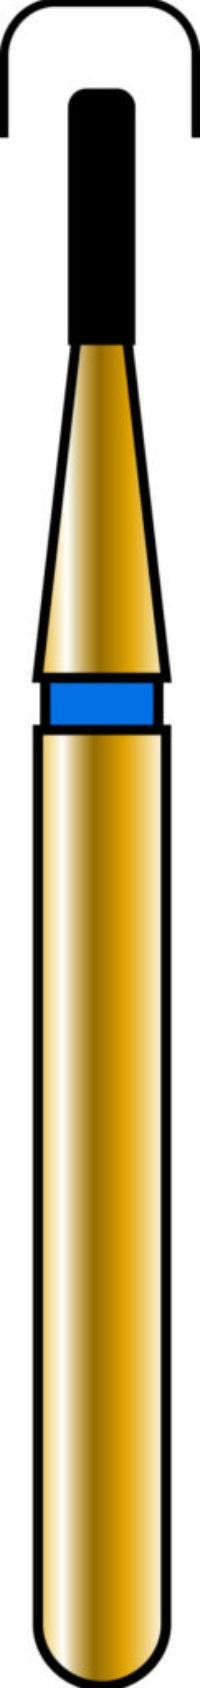 Round Edge Cylinder 08-3mm Gold Diamond Bur - Coarse Grit